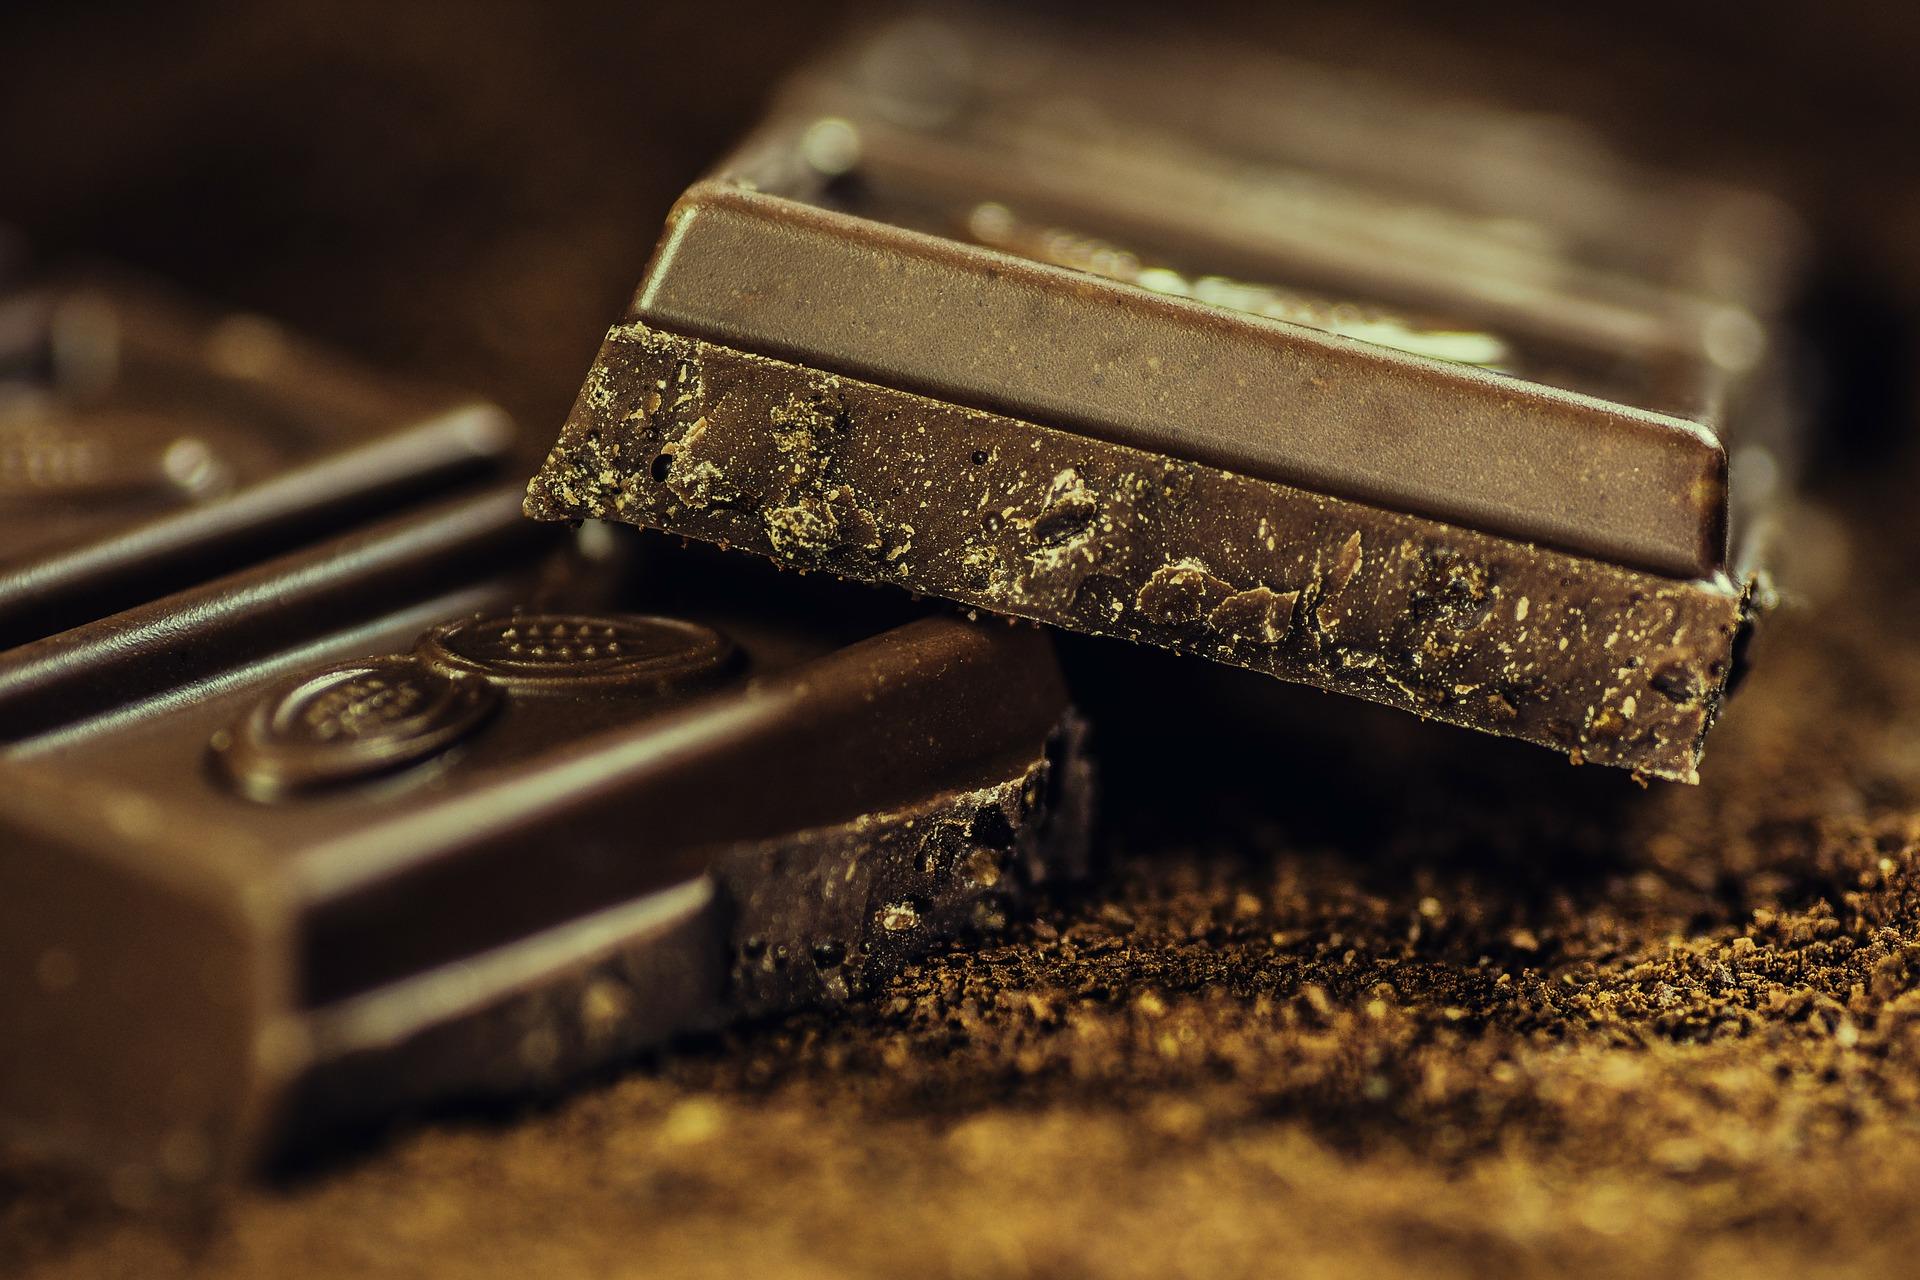 4965-cokolada.jpg